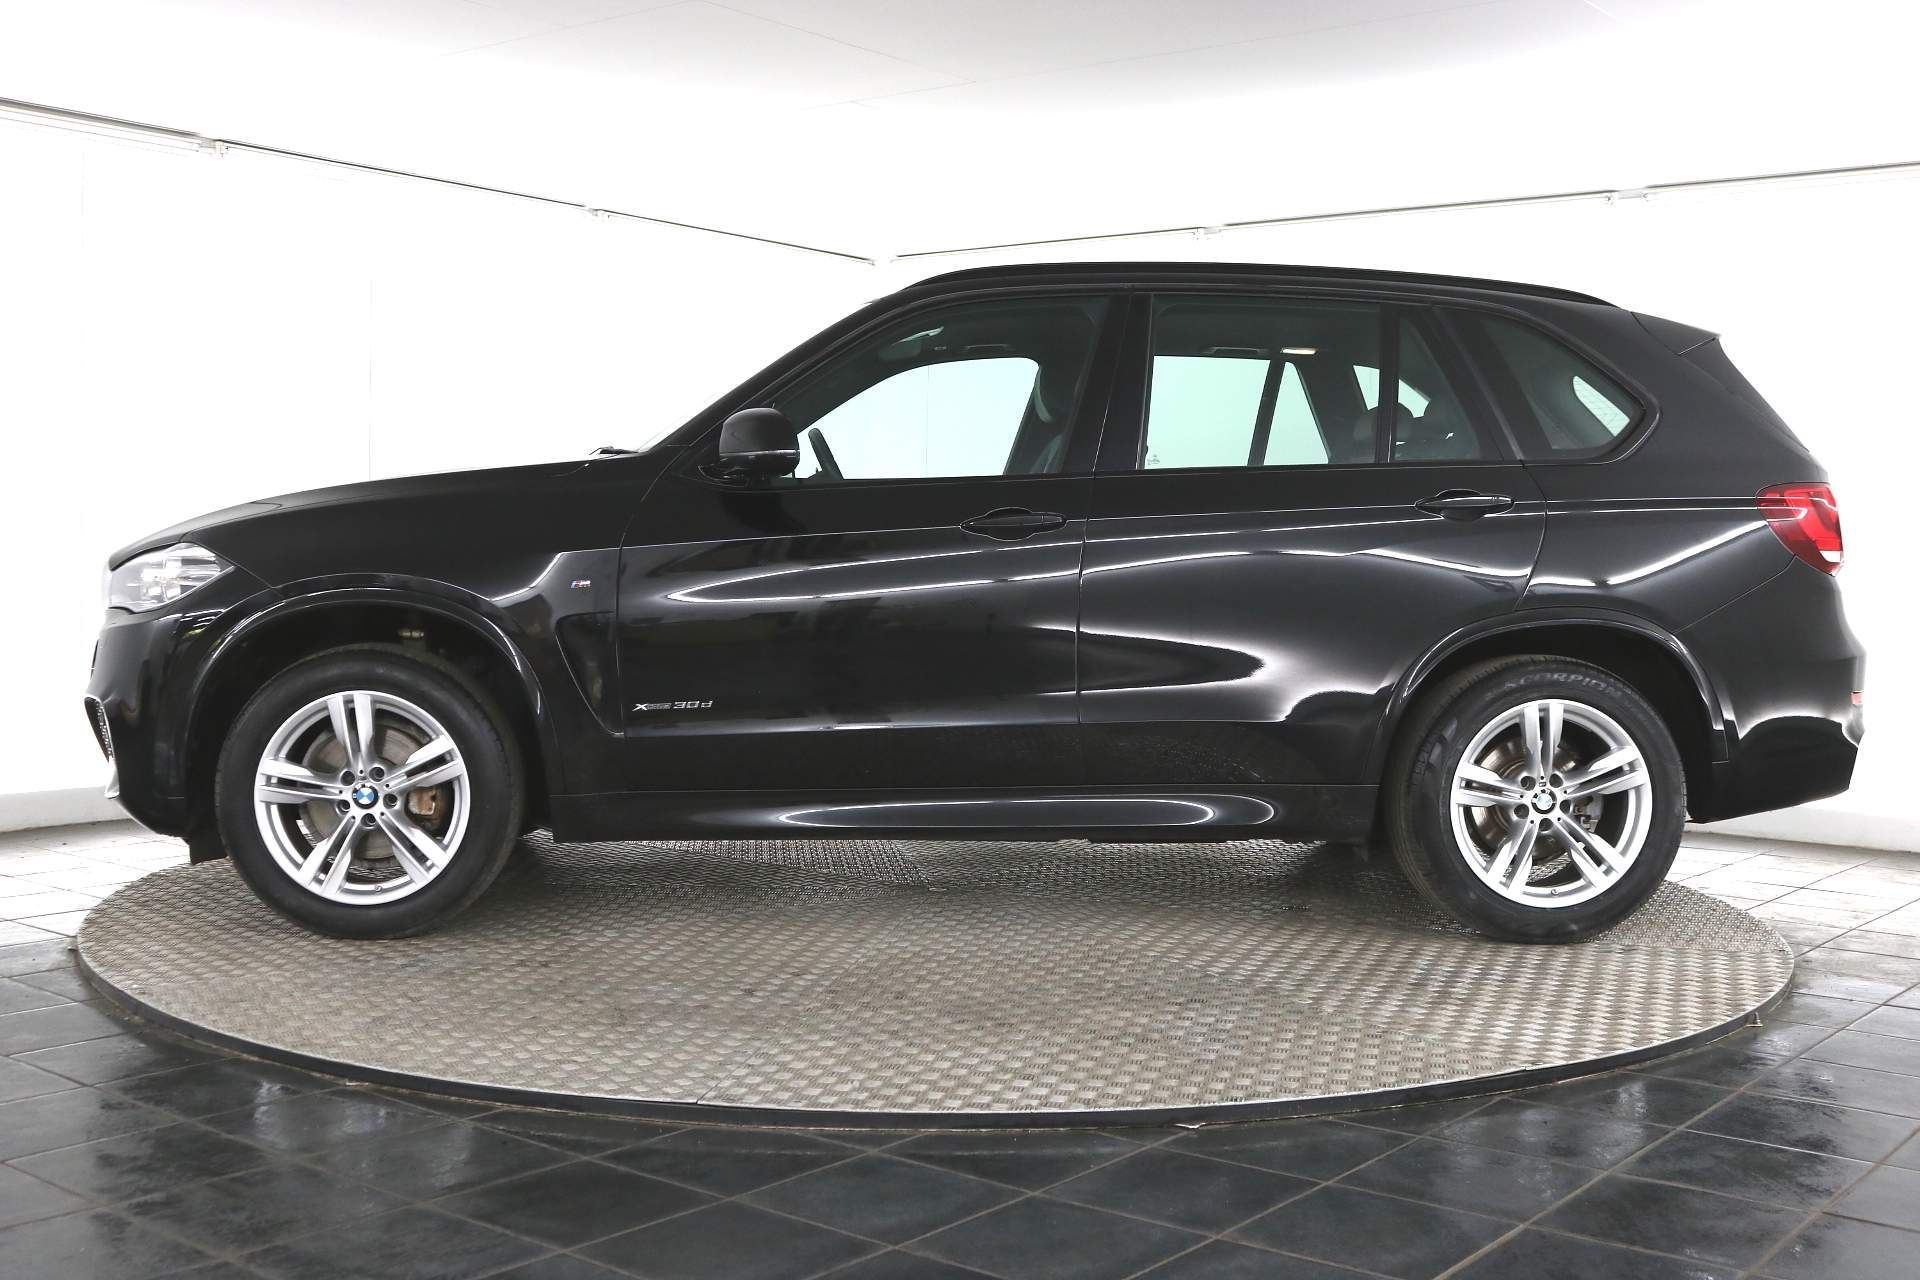 "BMW X5 3.0d xDrive""Auto"" Special Equipment - 15 Reg - 7 Seater -Leather - Sat Nav -Mega Spec- No Vat - Image 2 of 13"